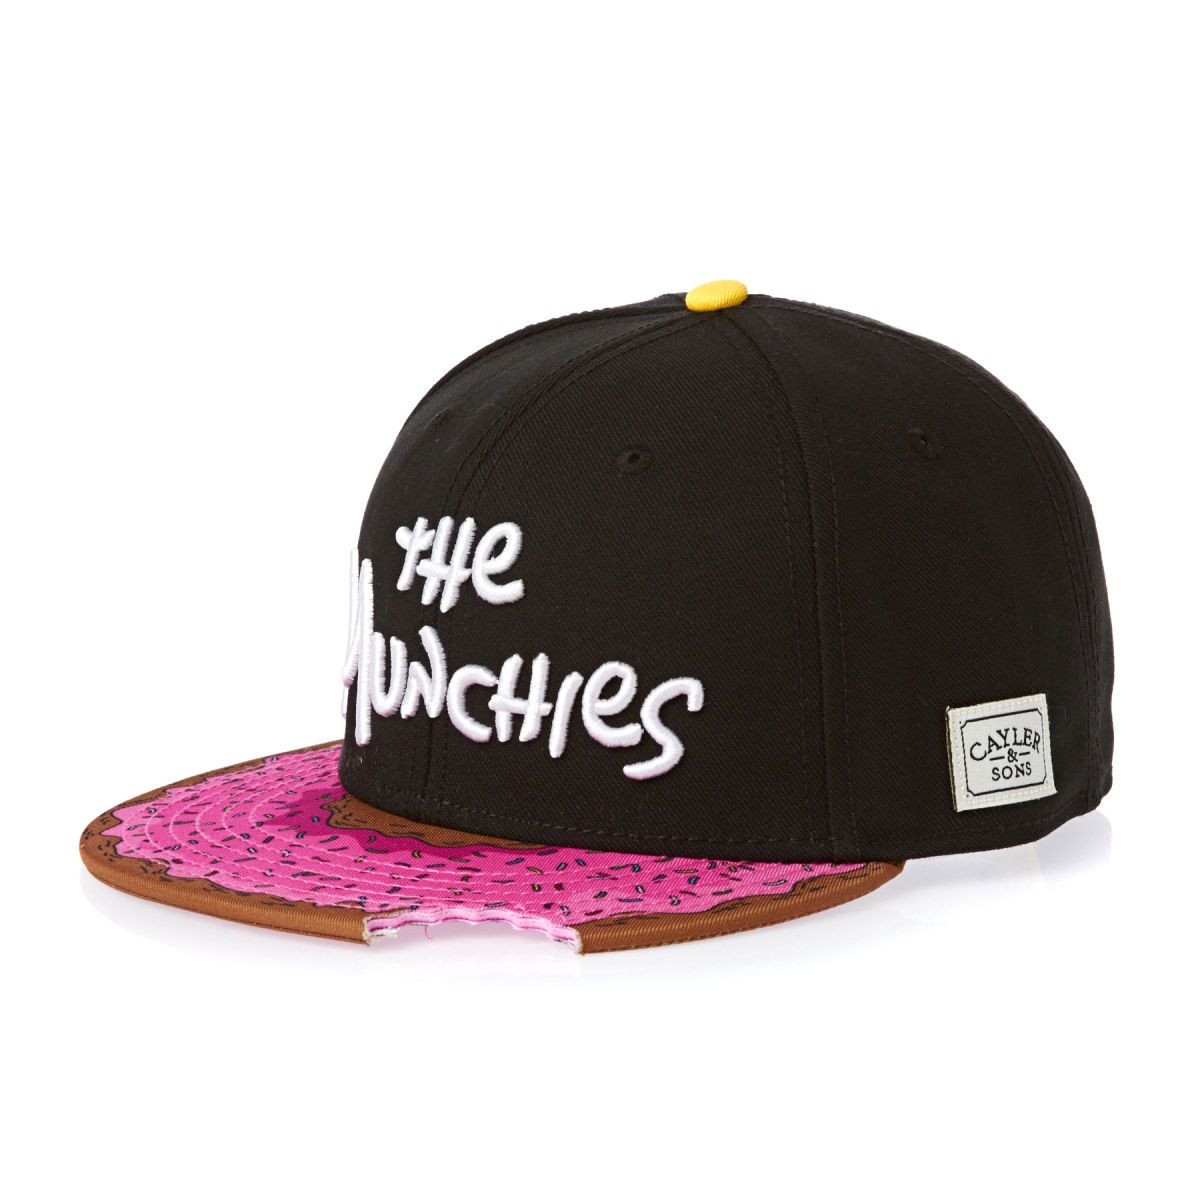 78c845ee39 Cayler   Sons Munchies Boné - Black pink Donut white